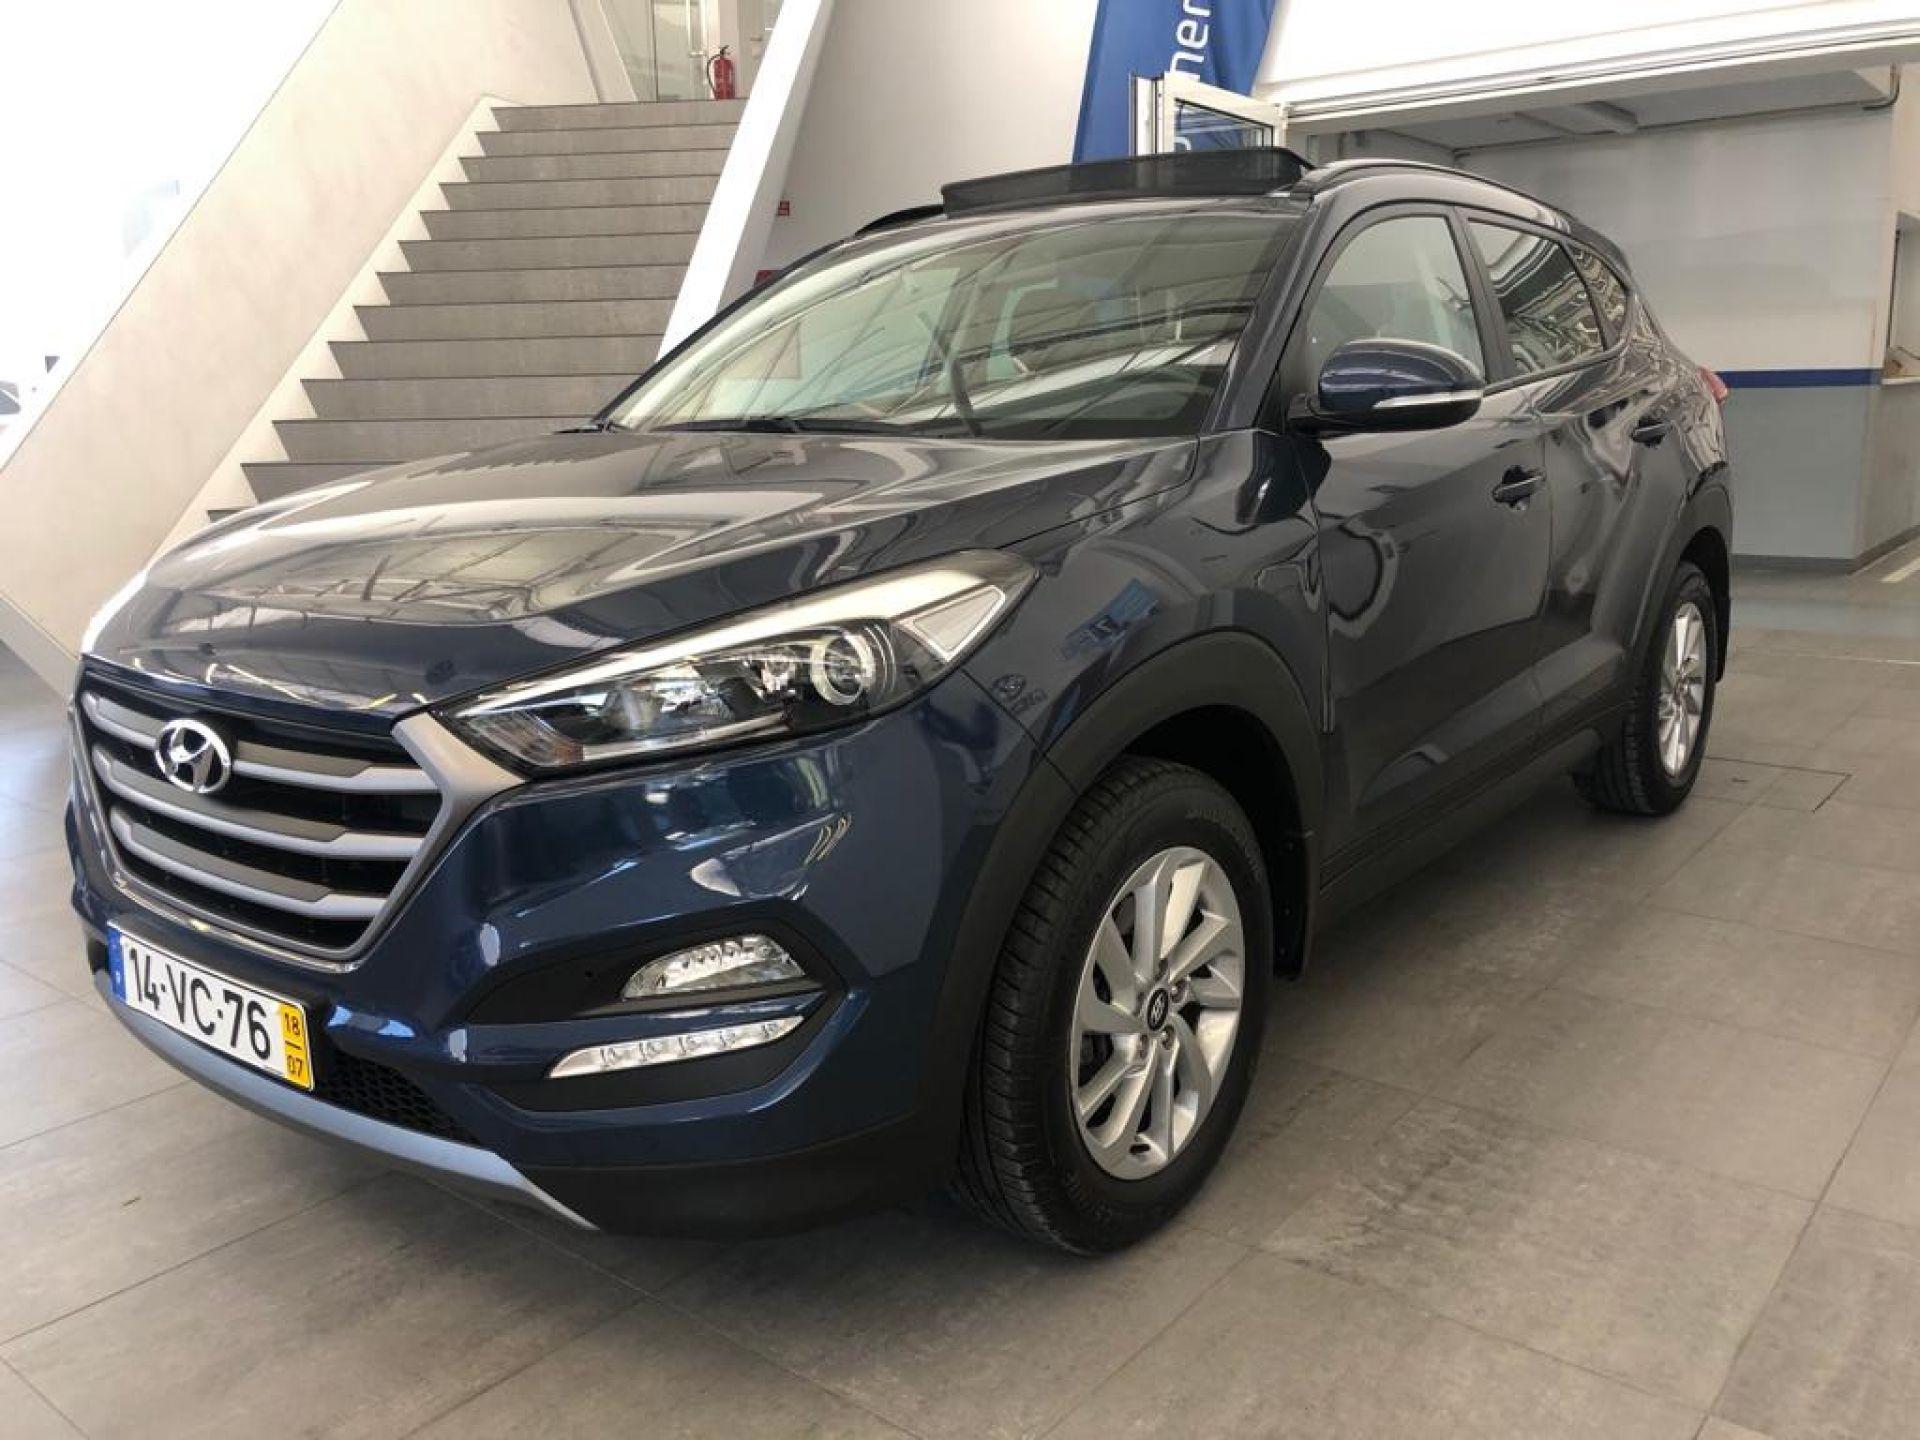 Hyundai Tucson 1.7 CRDi EXECUTIV+ TMY17 usada Porto